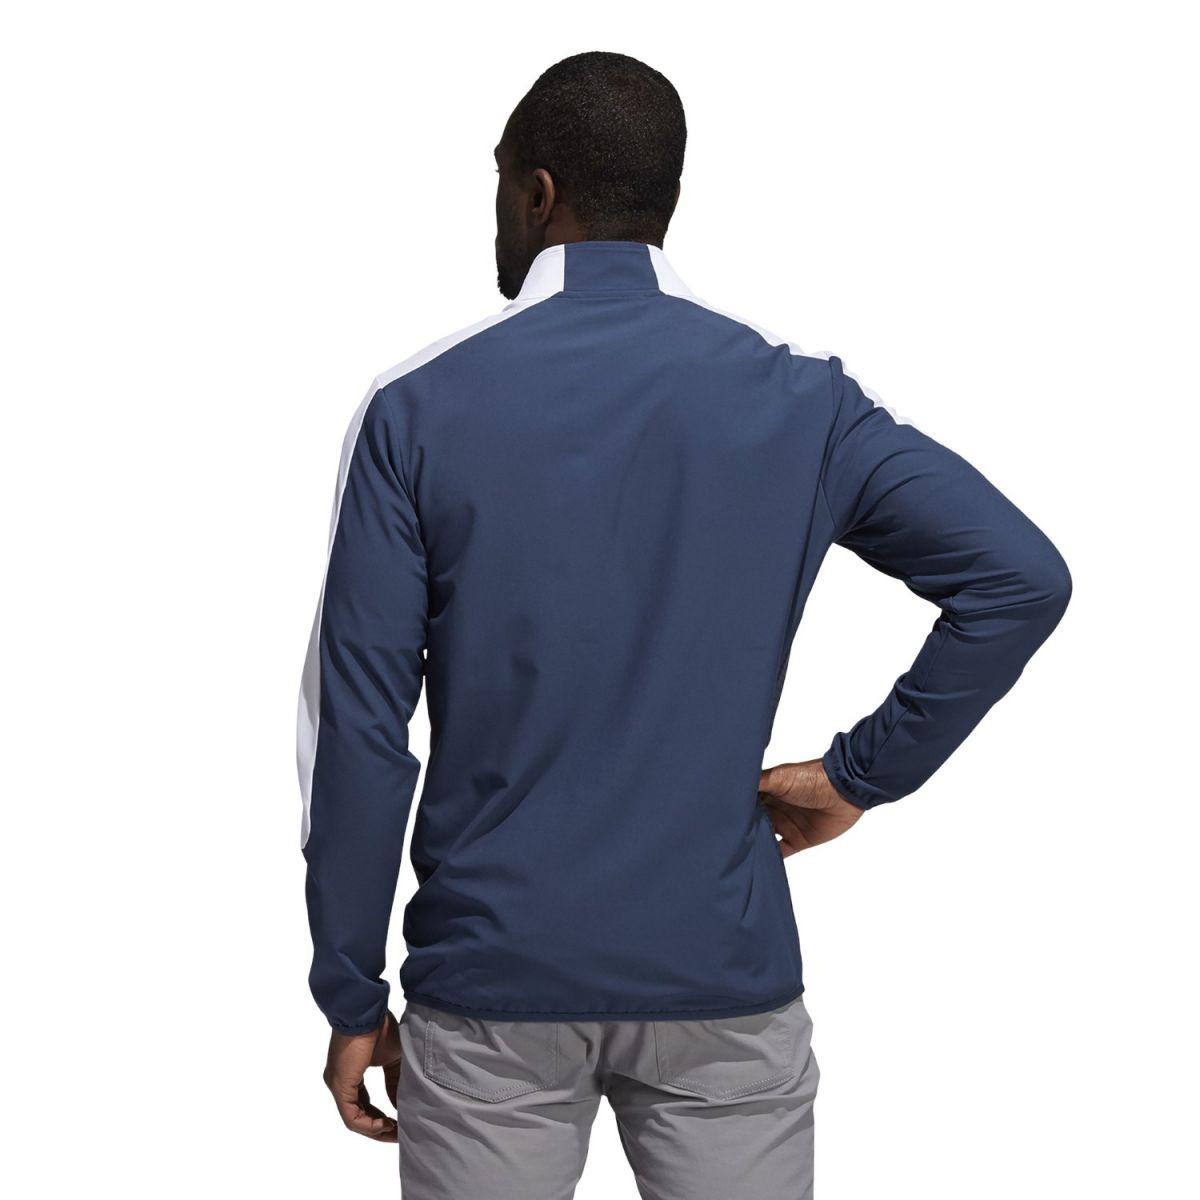 adidas jacket 14 zip print navy white xl